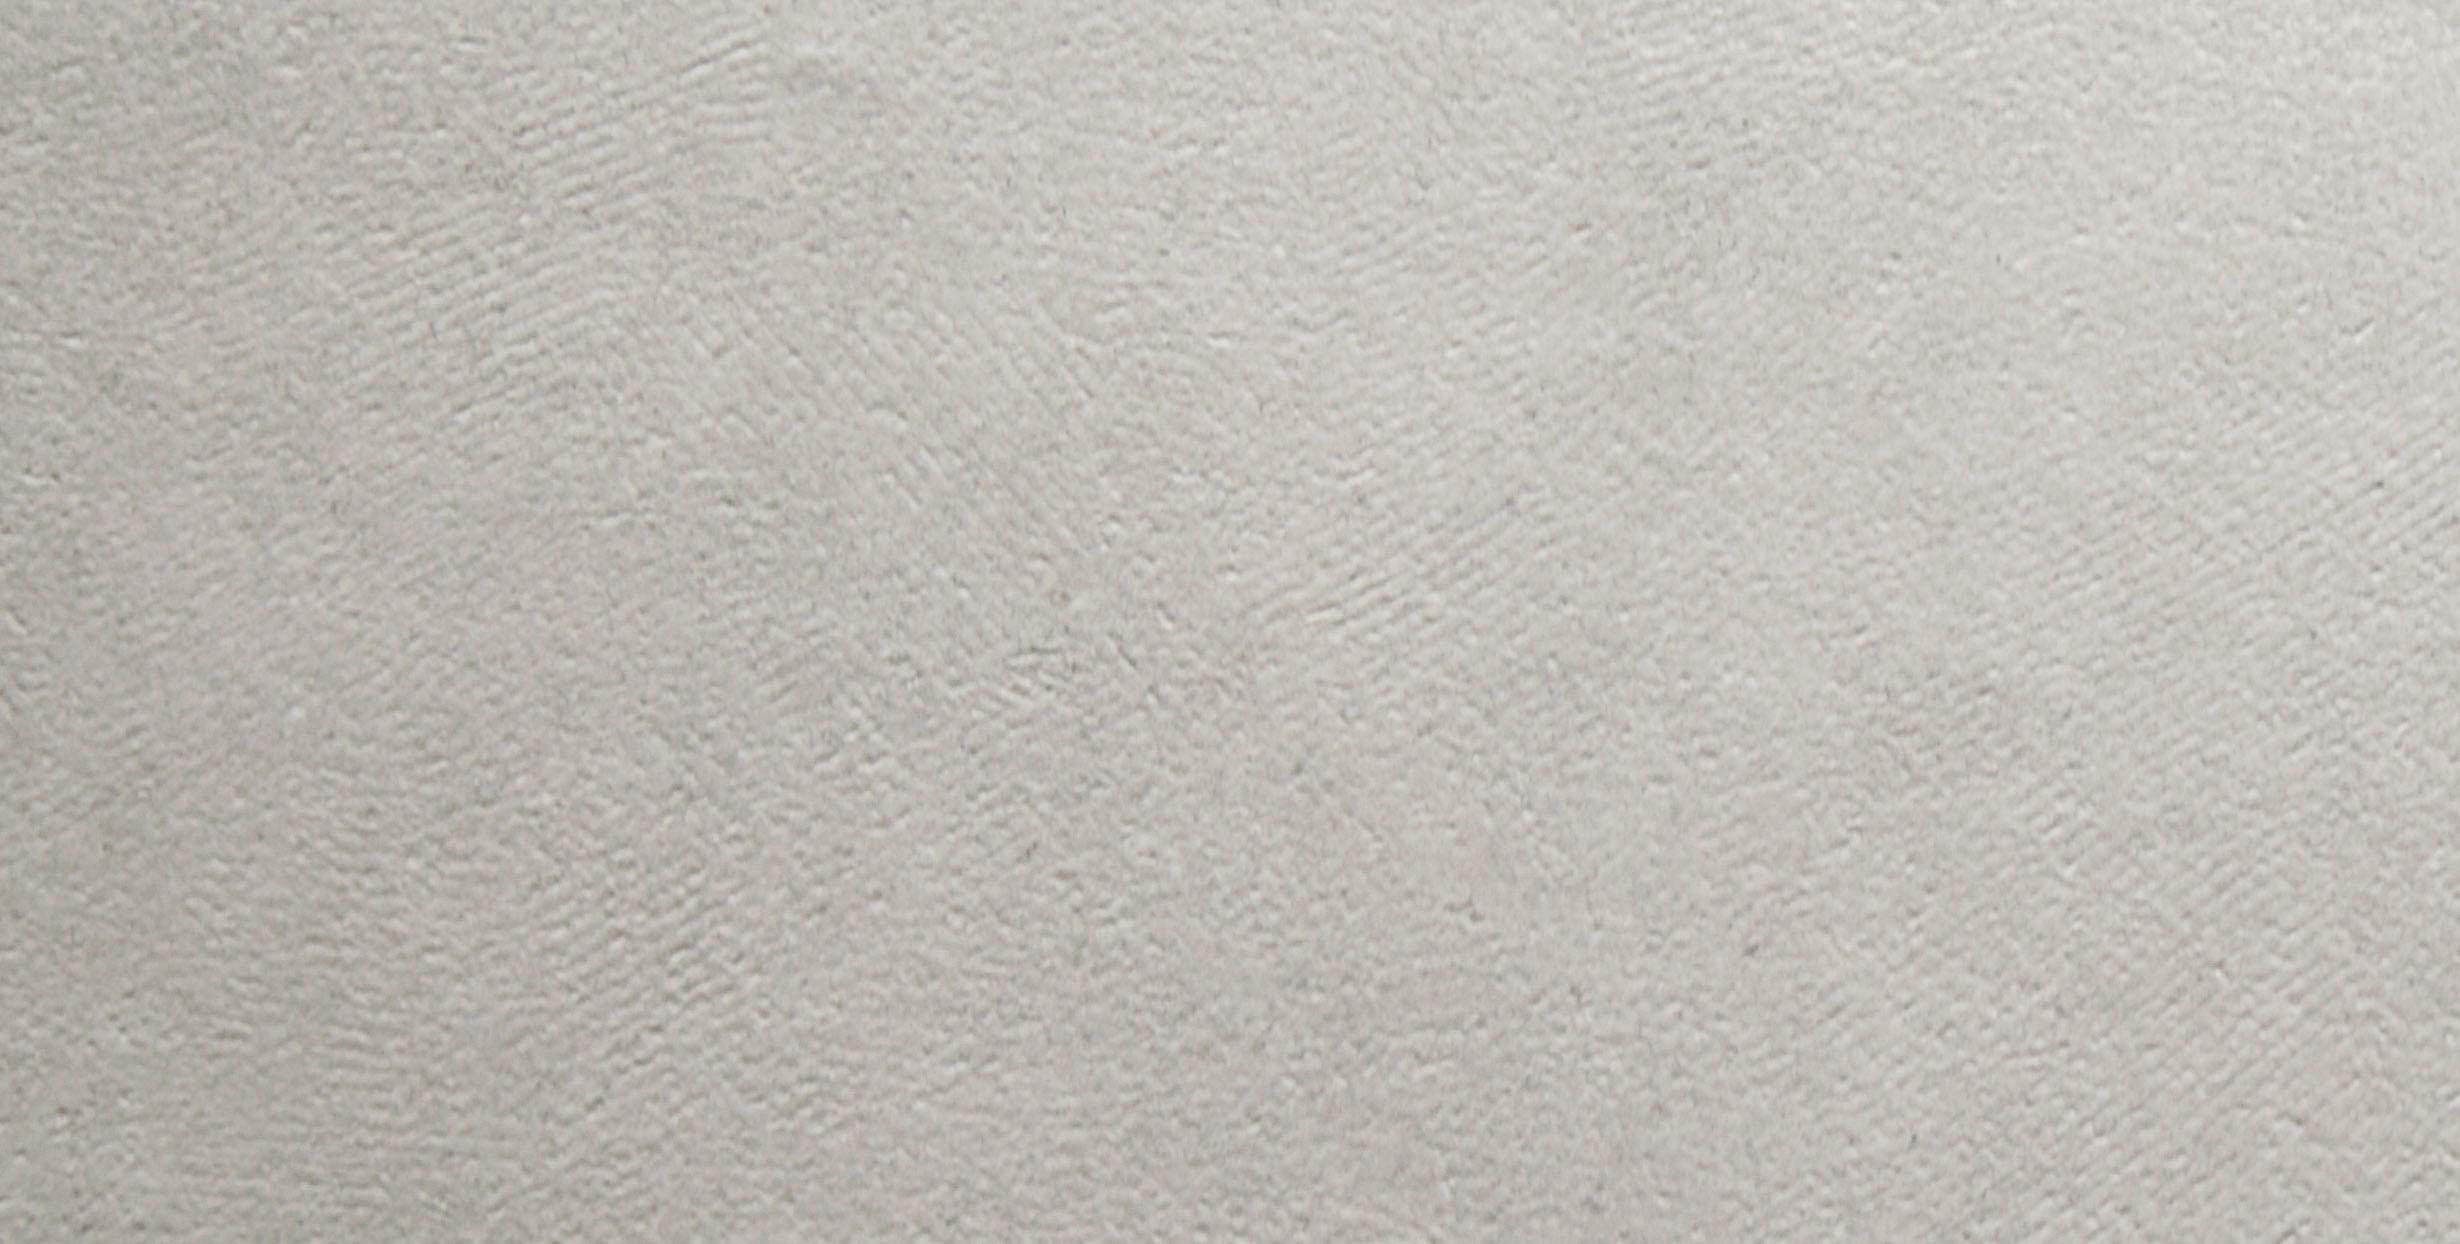 Stratus Wall Ceramic Tiles